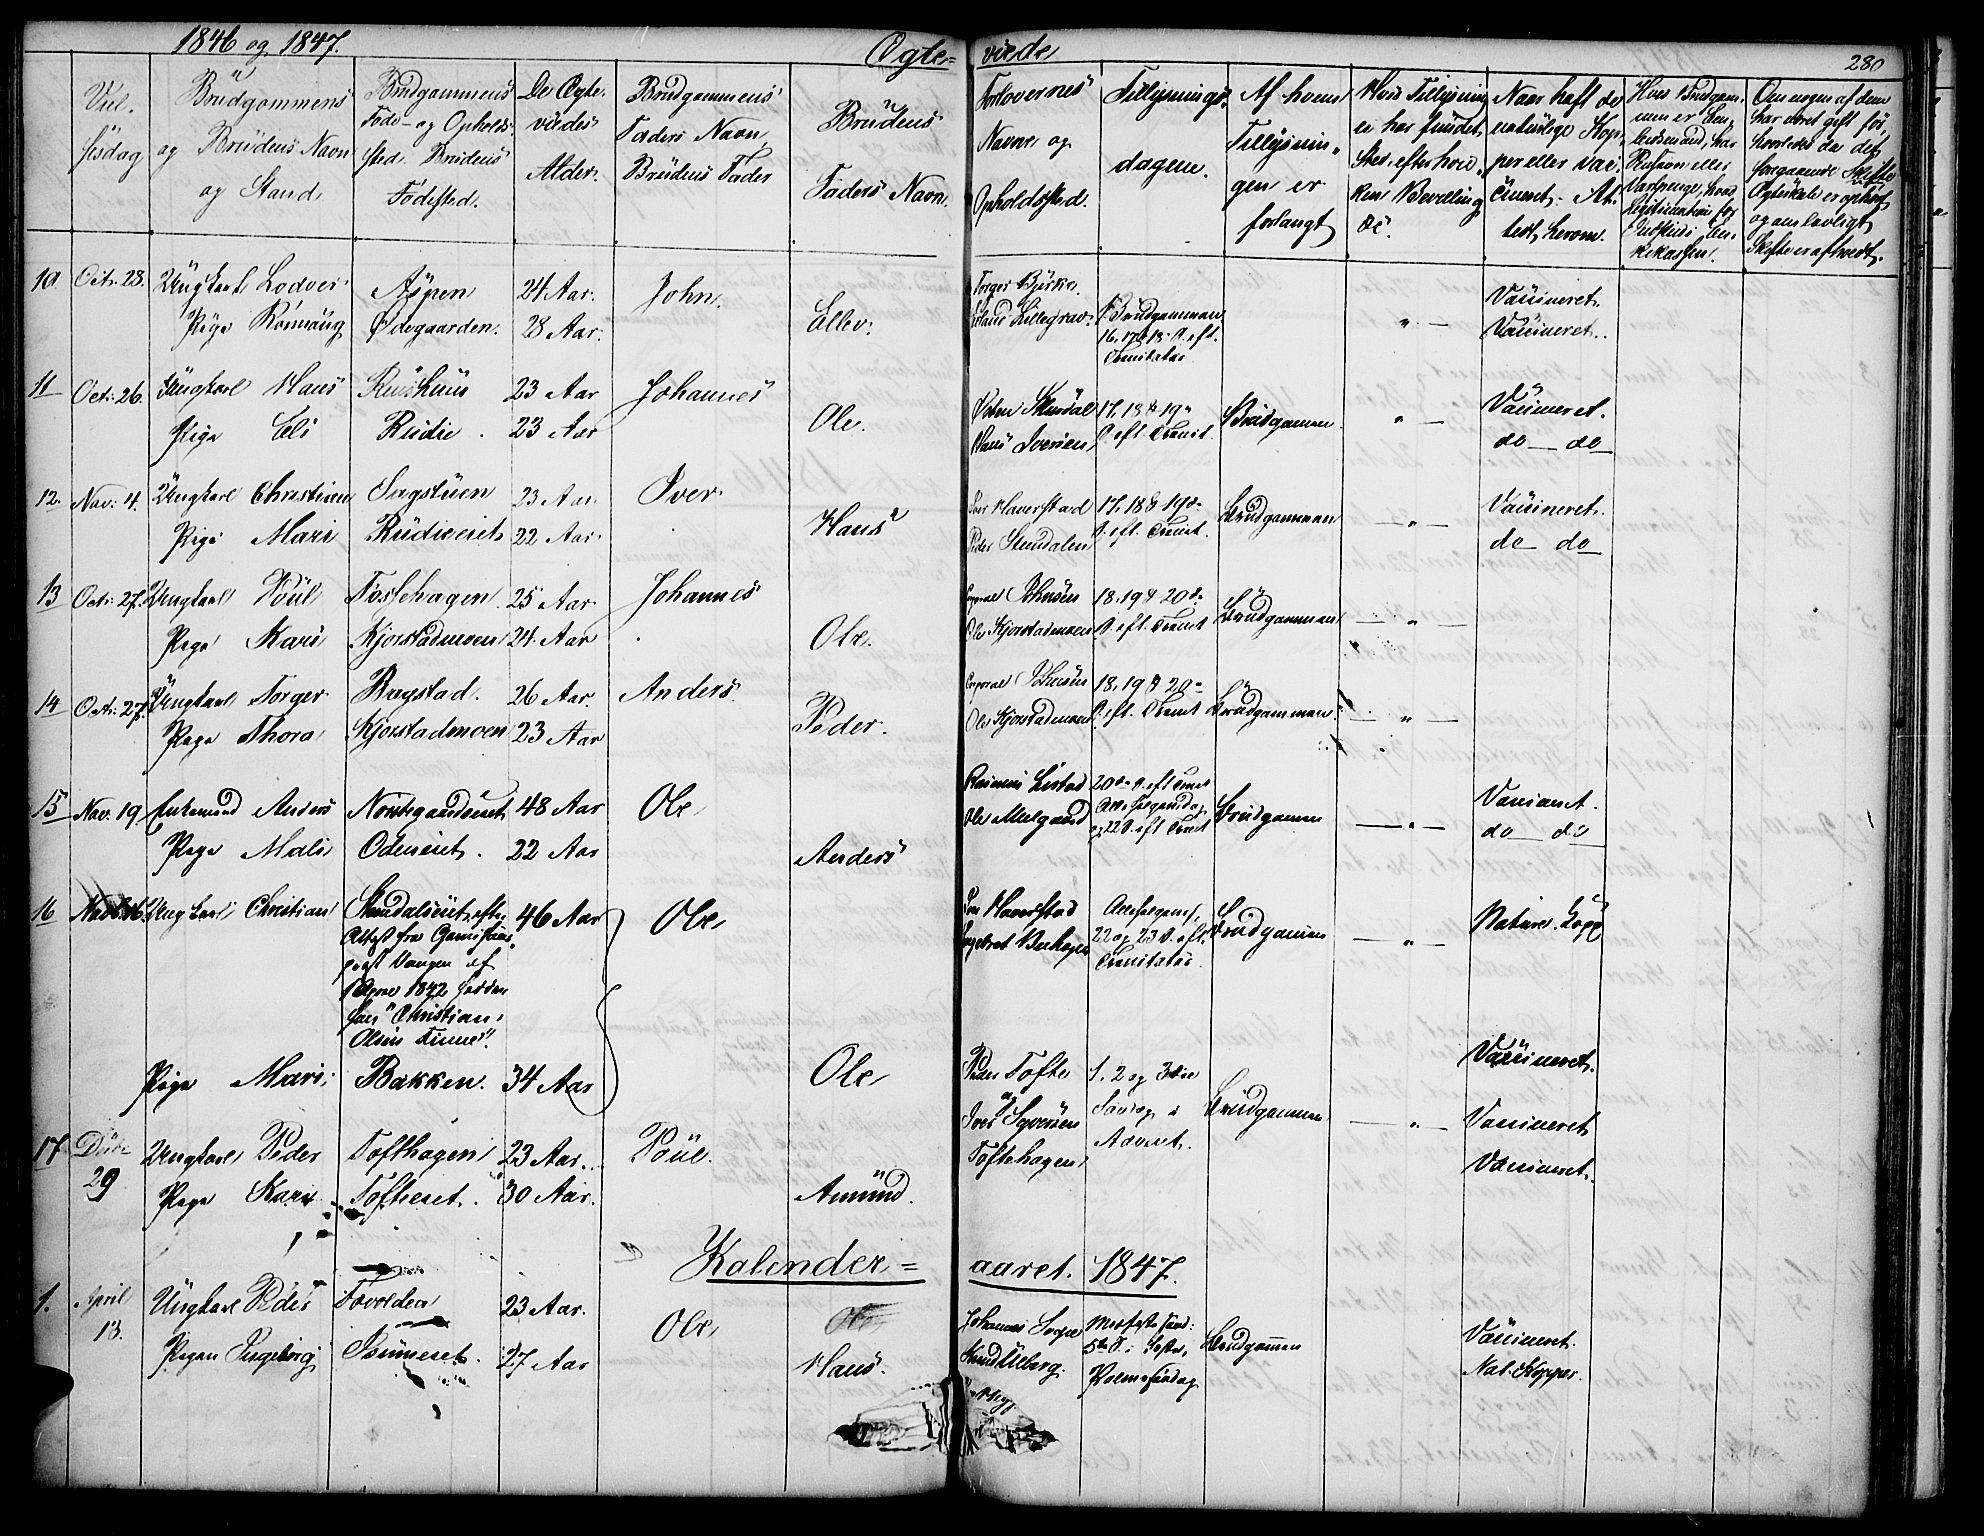 SAH, Sør-Fron prestekontor, H/Ha/Hab/L0001: Klokkerbok nr. 1, 1844-1863, s. 280